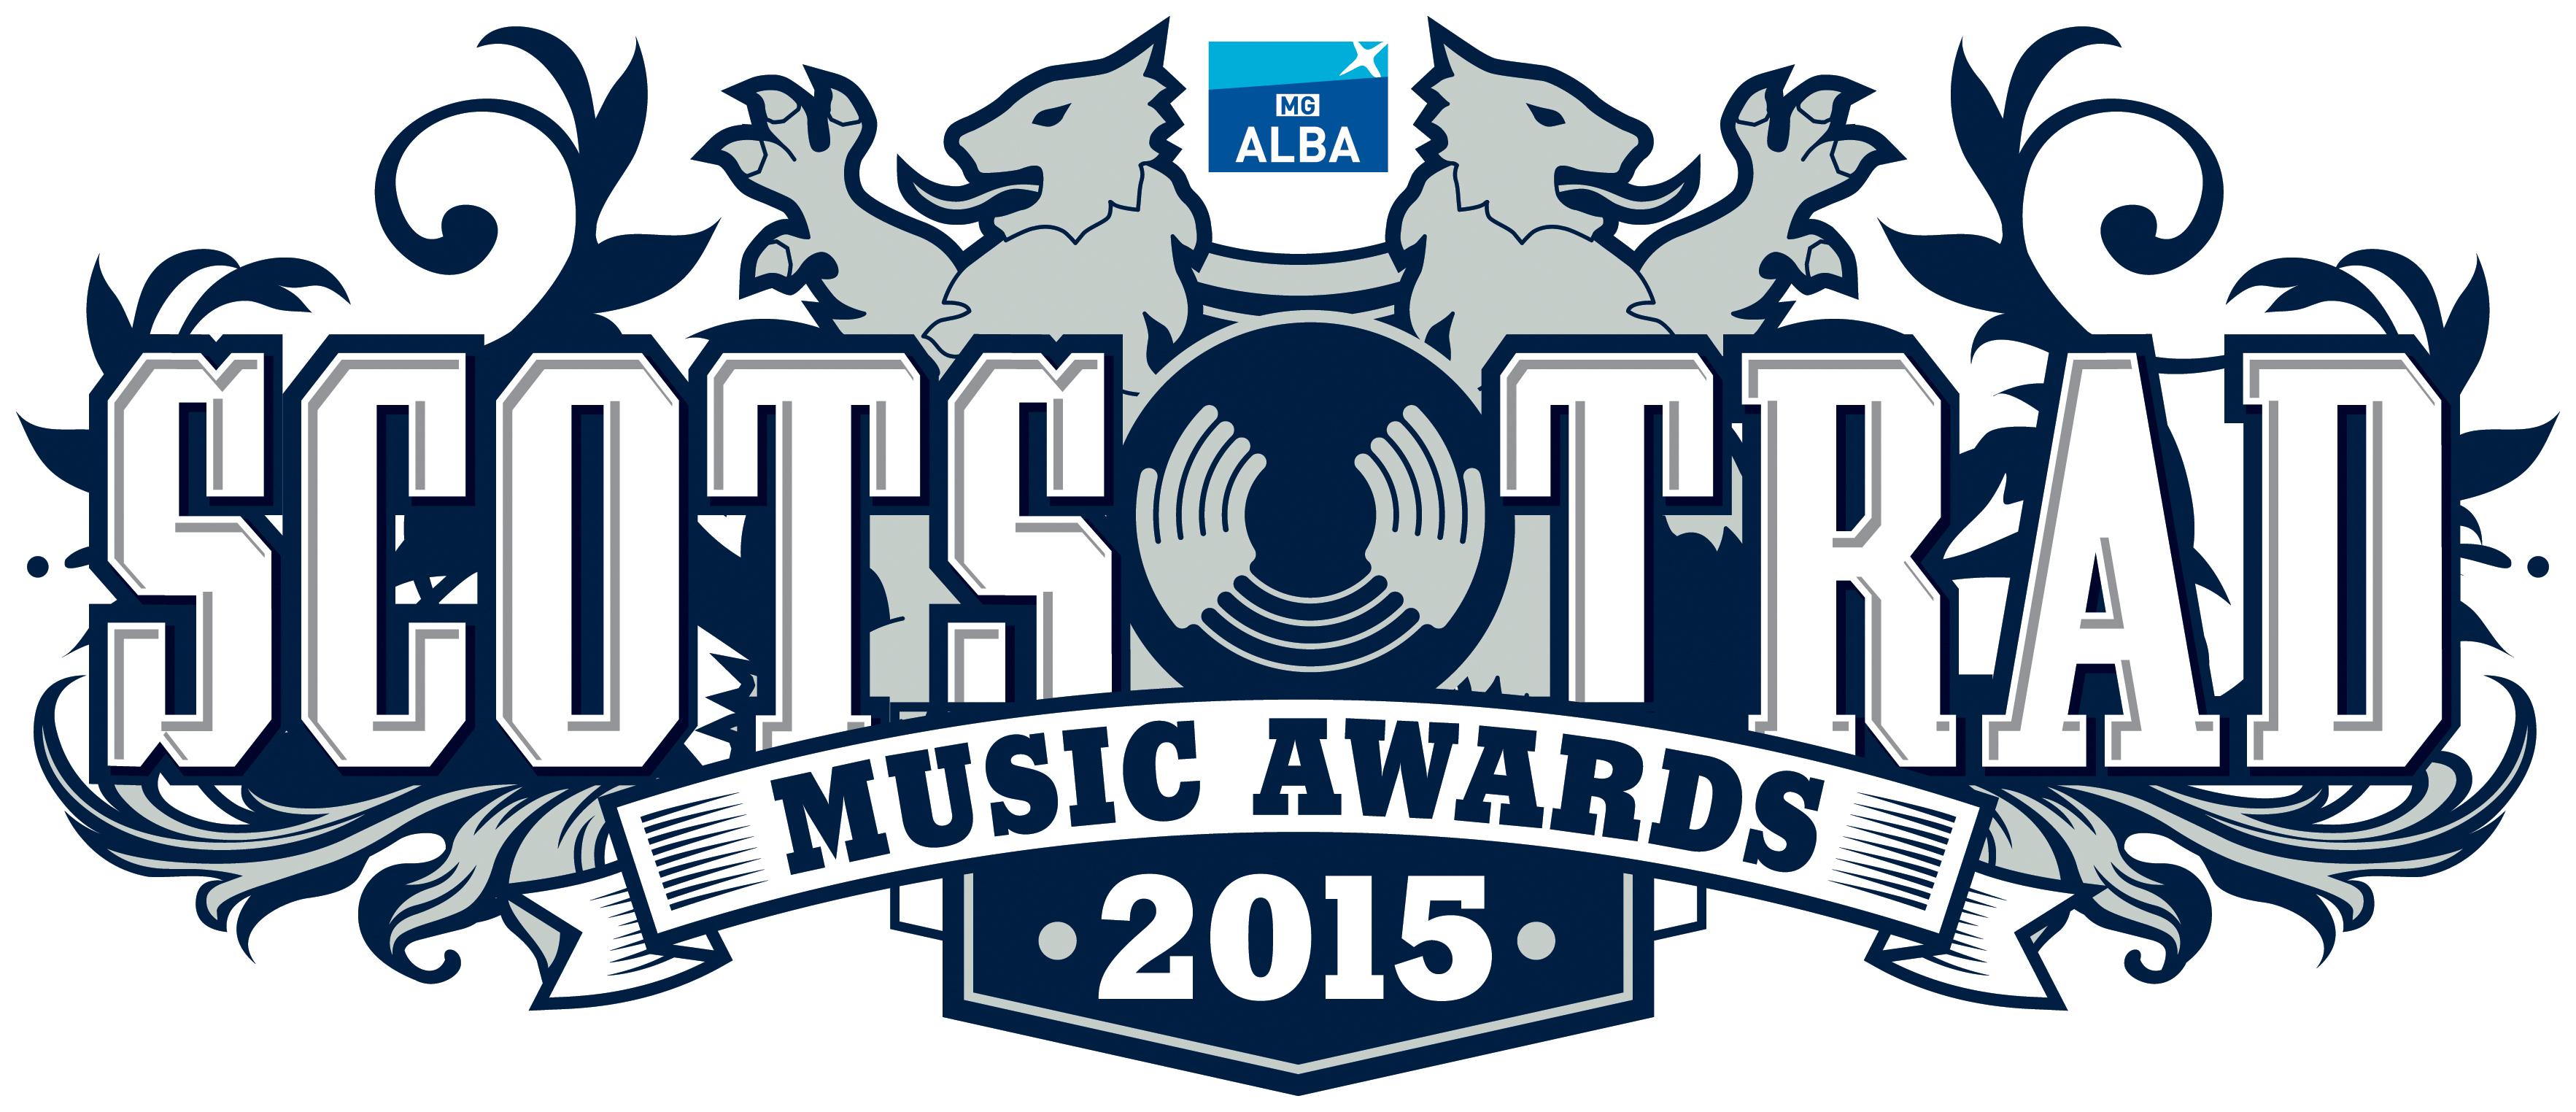 Scots Trad Music Awards logo